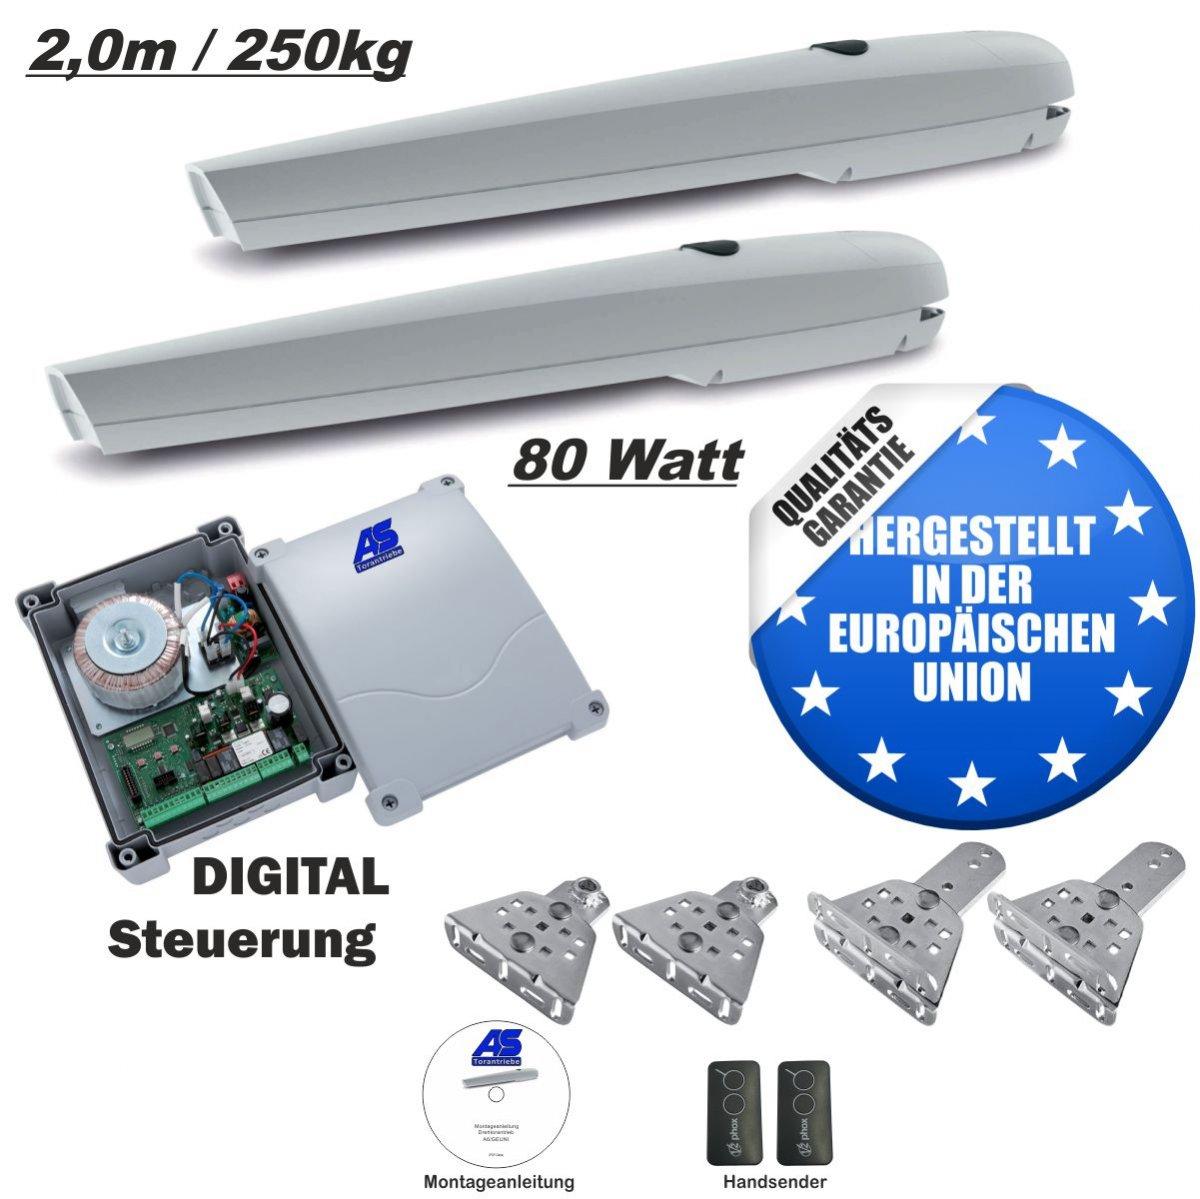 Lichtschranke LED-Blink Drehtorantrieb VS2 1-flügelig Set 24V mit 2 Handsender